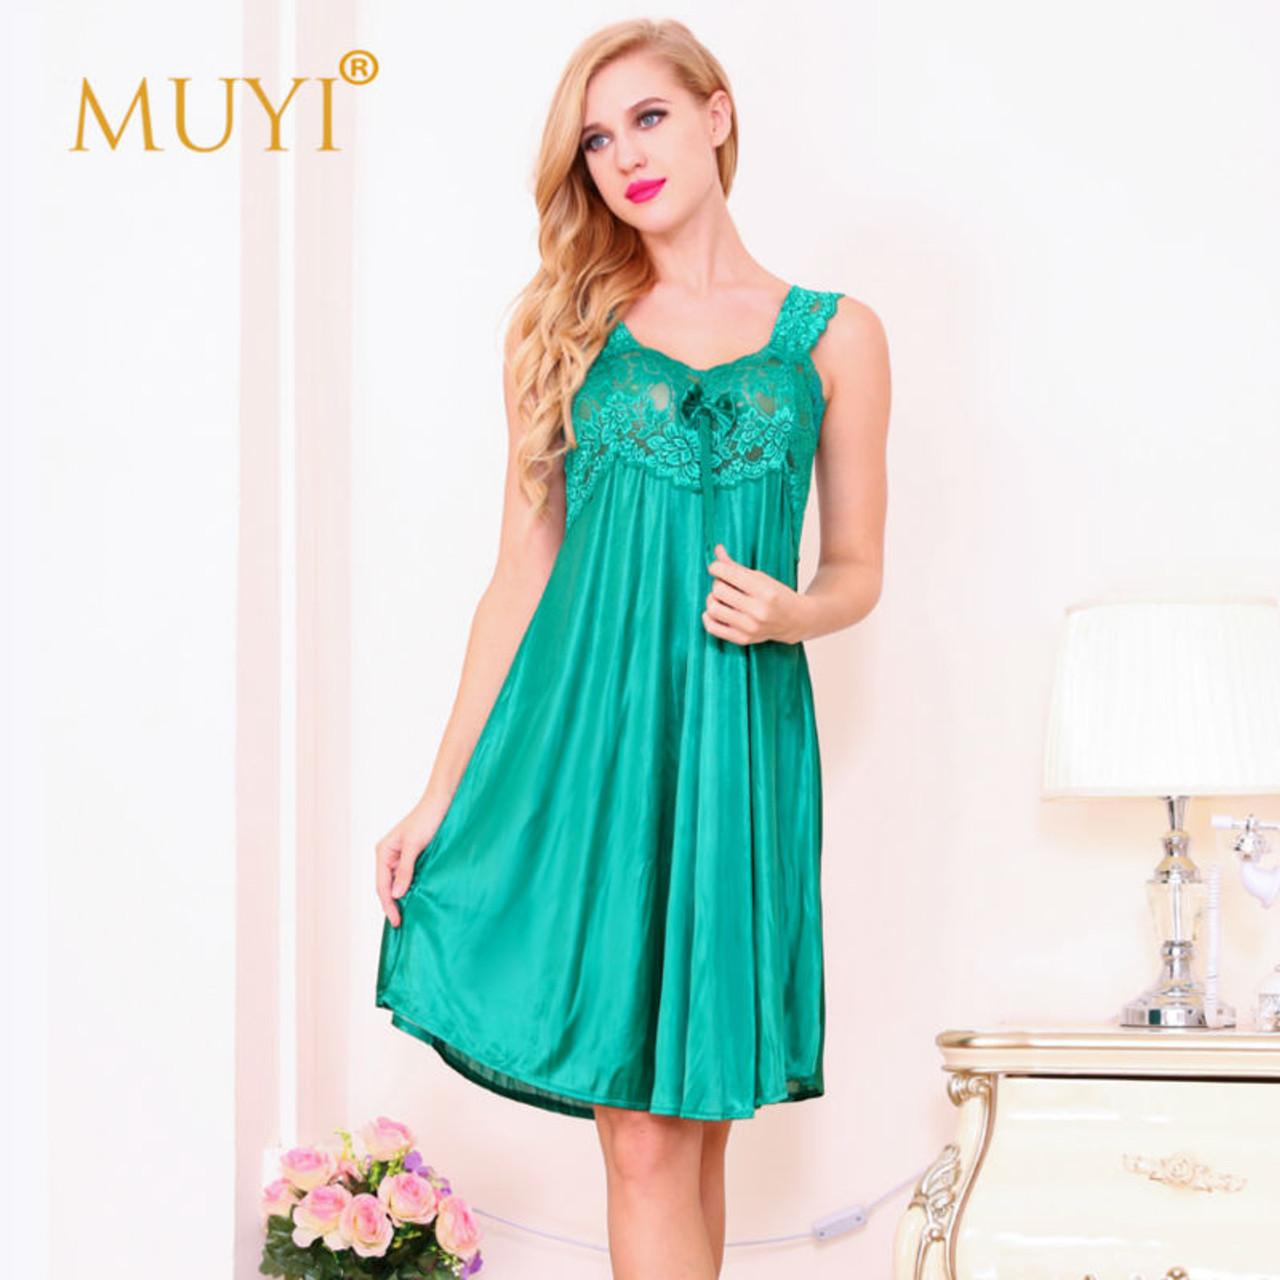 6c0f246bdc90 ... Nightgowns Sexy Sleepwear Women Nightwear Sexy Night Dresses Lace  Babydoll Dress Sleep Lounge Plus Size Nightgown ...